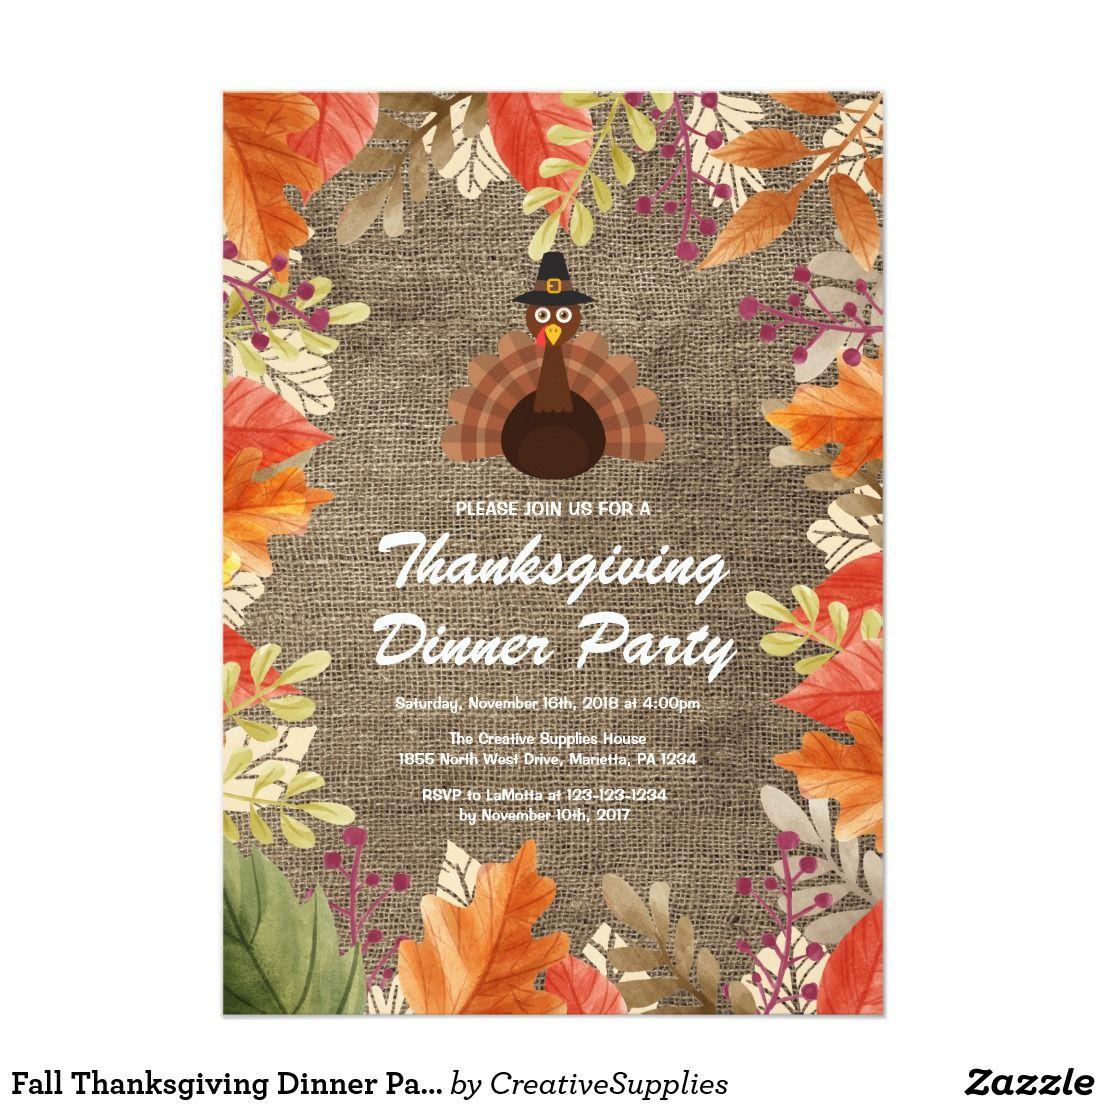 Fall Thanksgiving Dinner Party Invitation